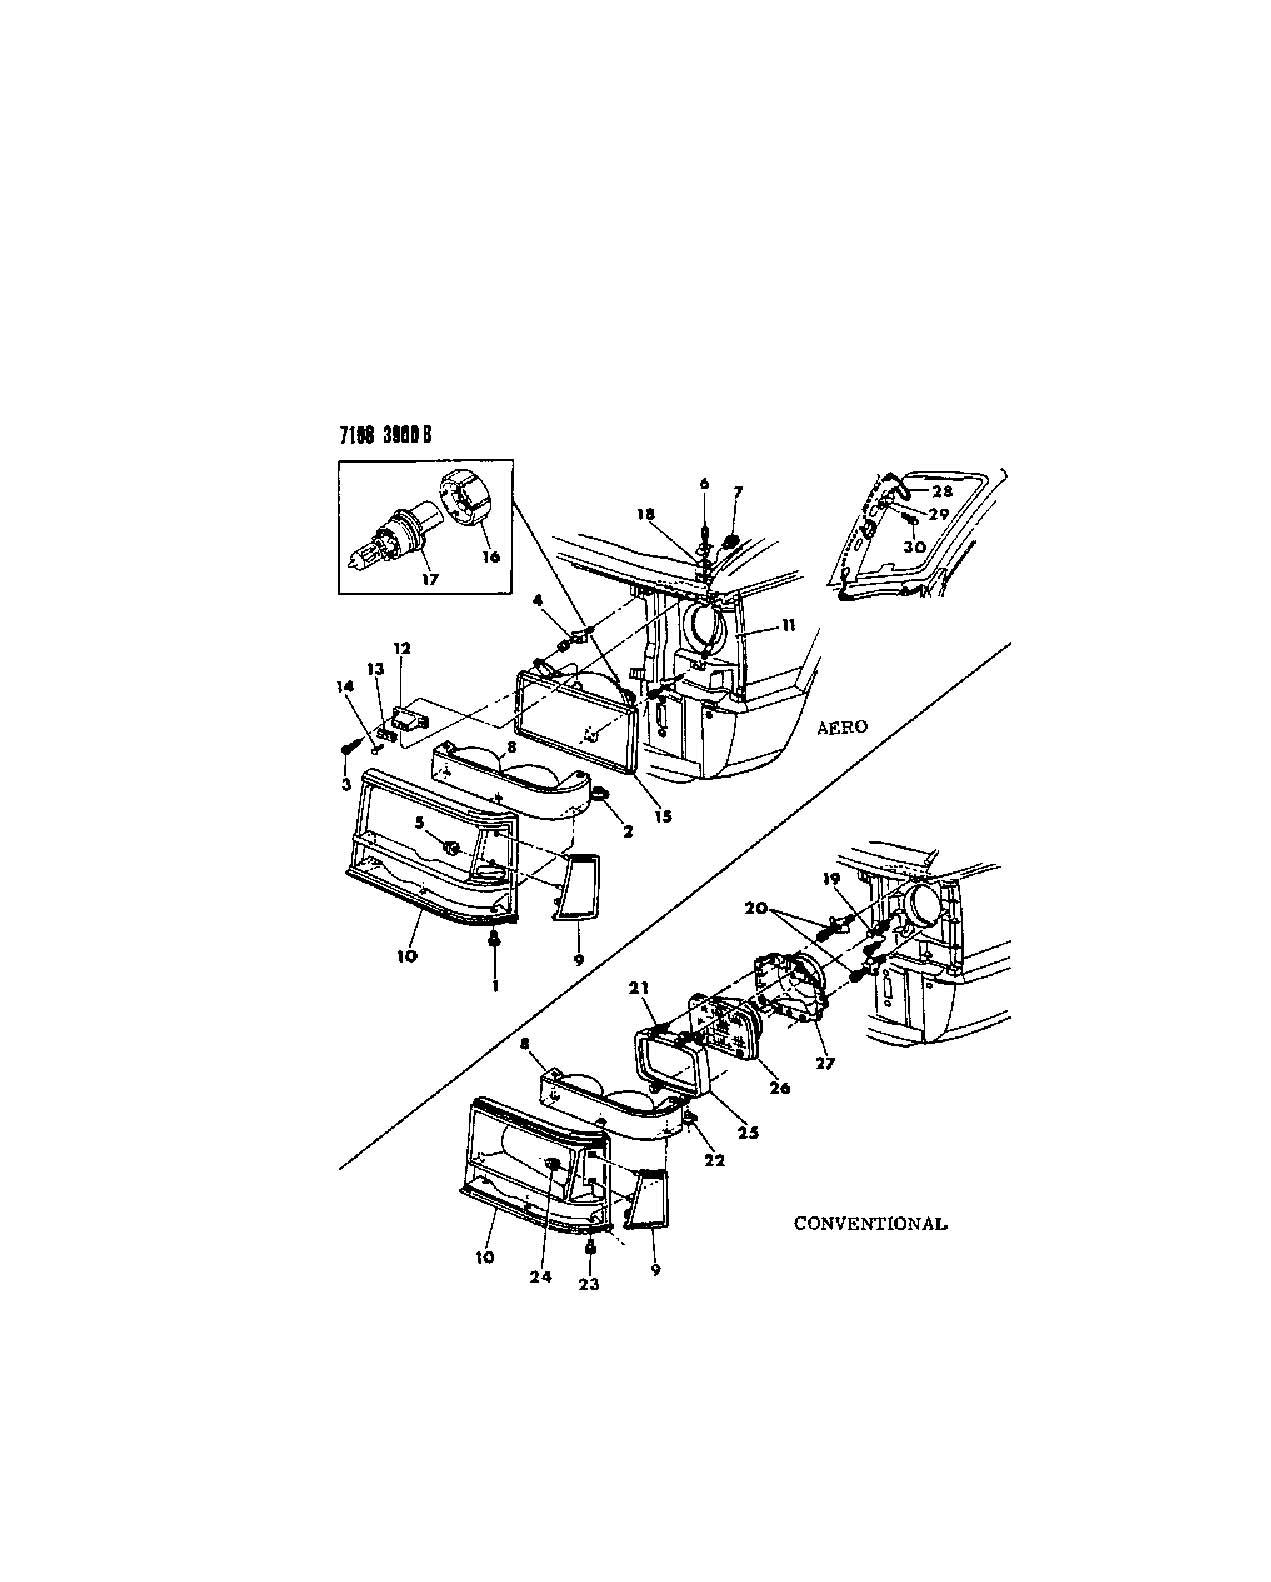 Nut and Screw Adjuster Headlamp Chrysler Dodge Plymouth 87 90 Mopar 04388249